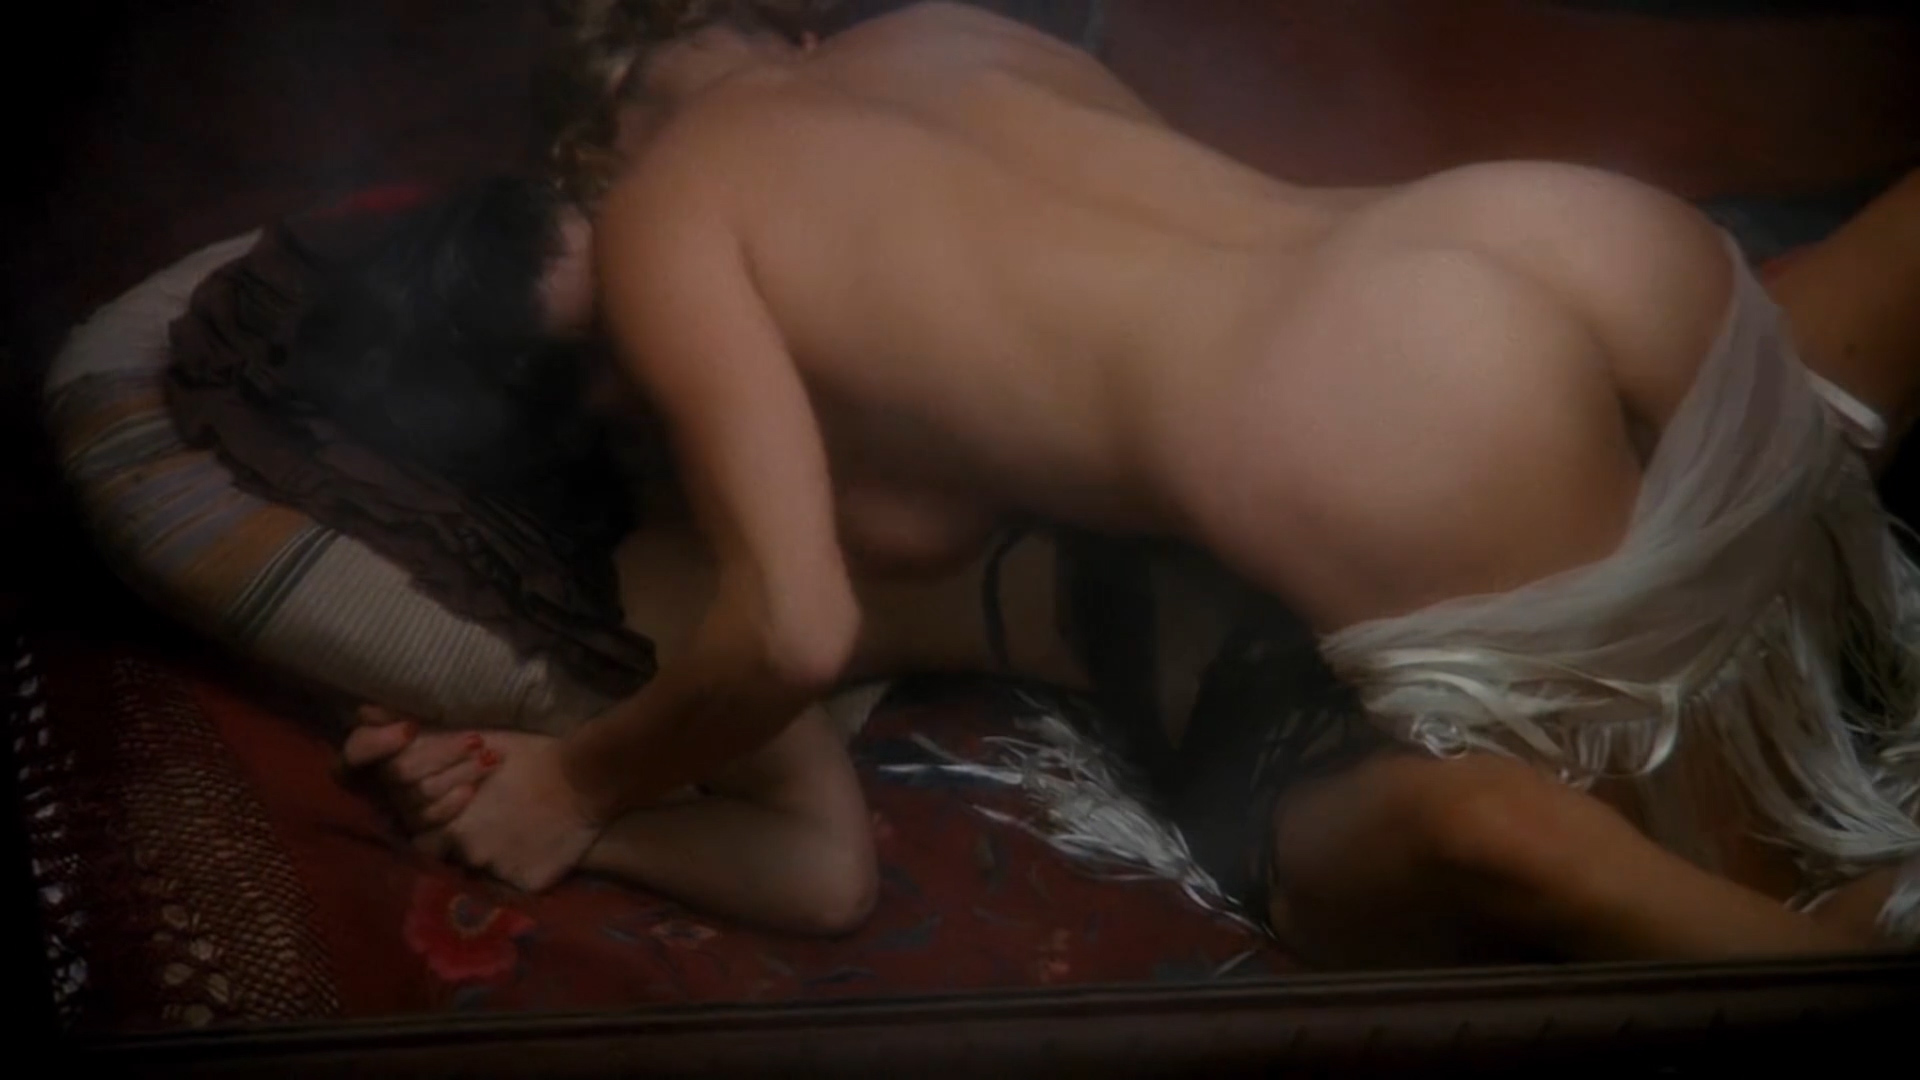 Henry and june lesbian sex scene consider, what